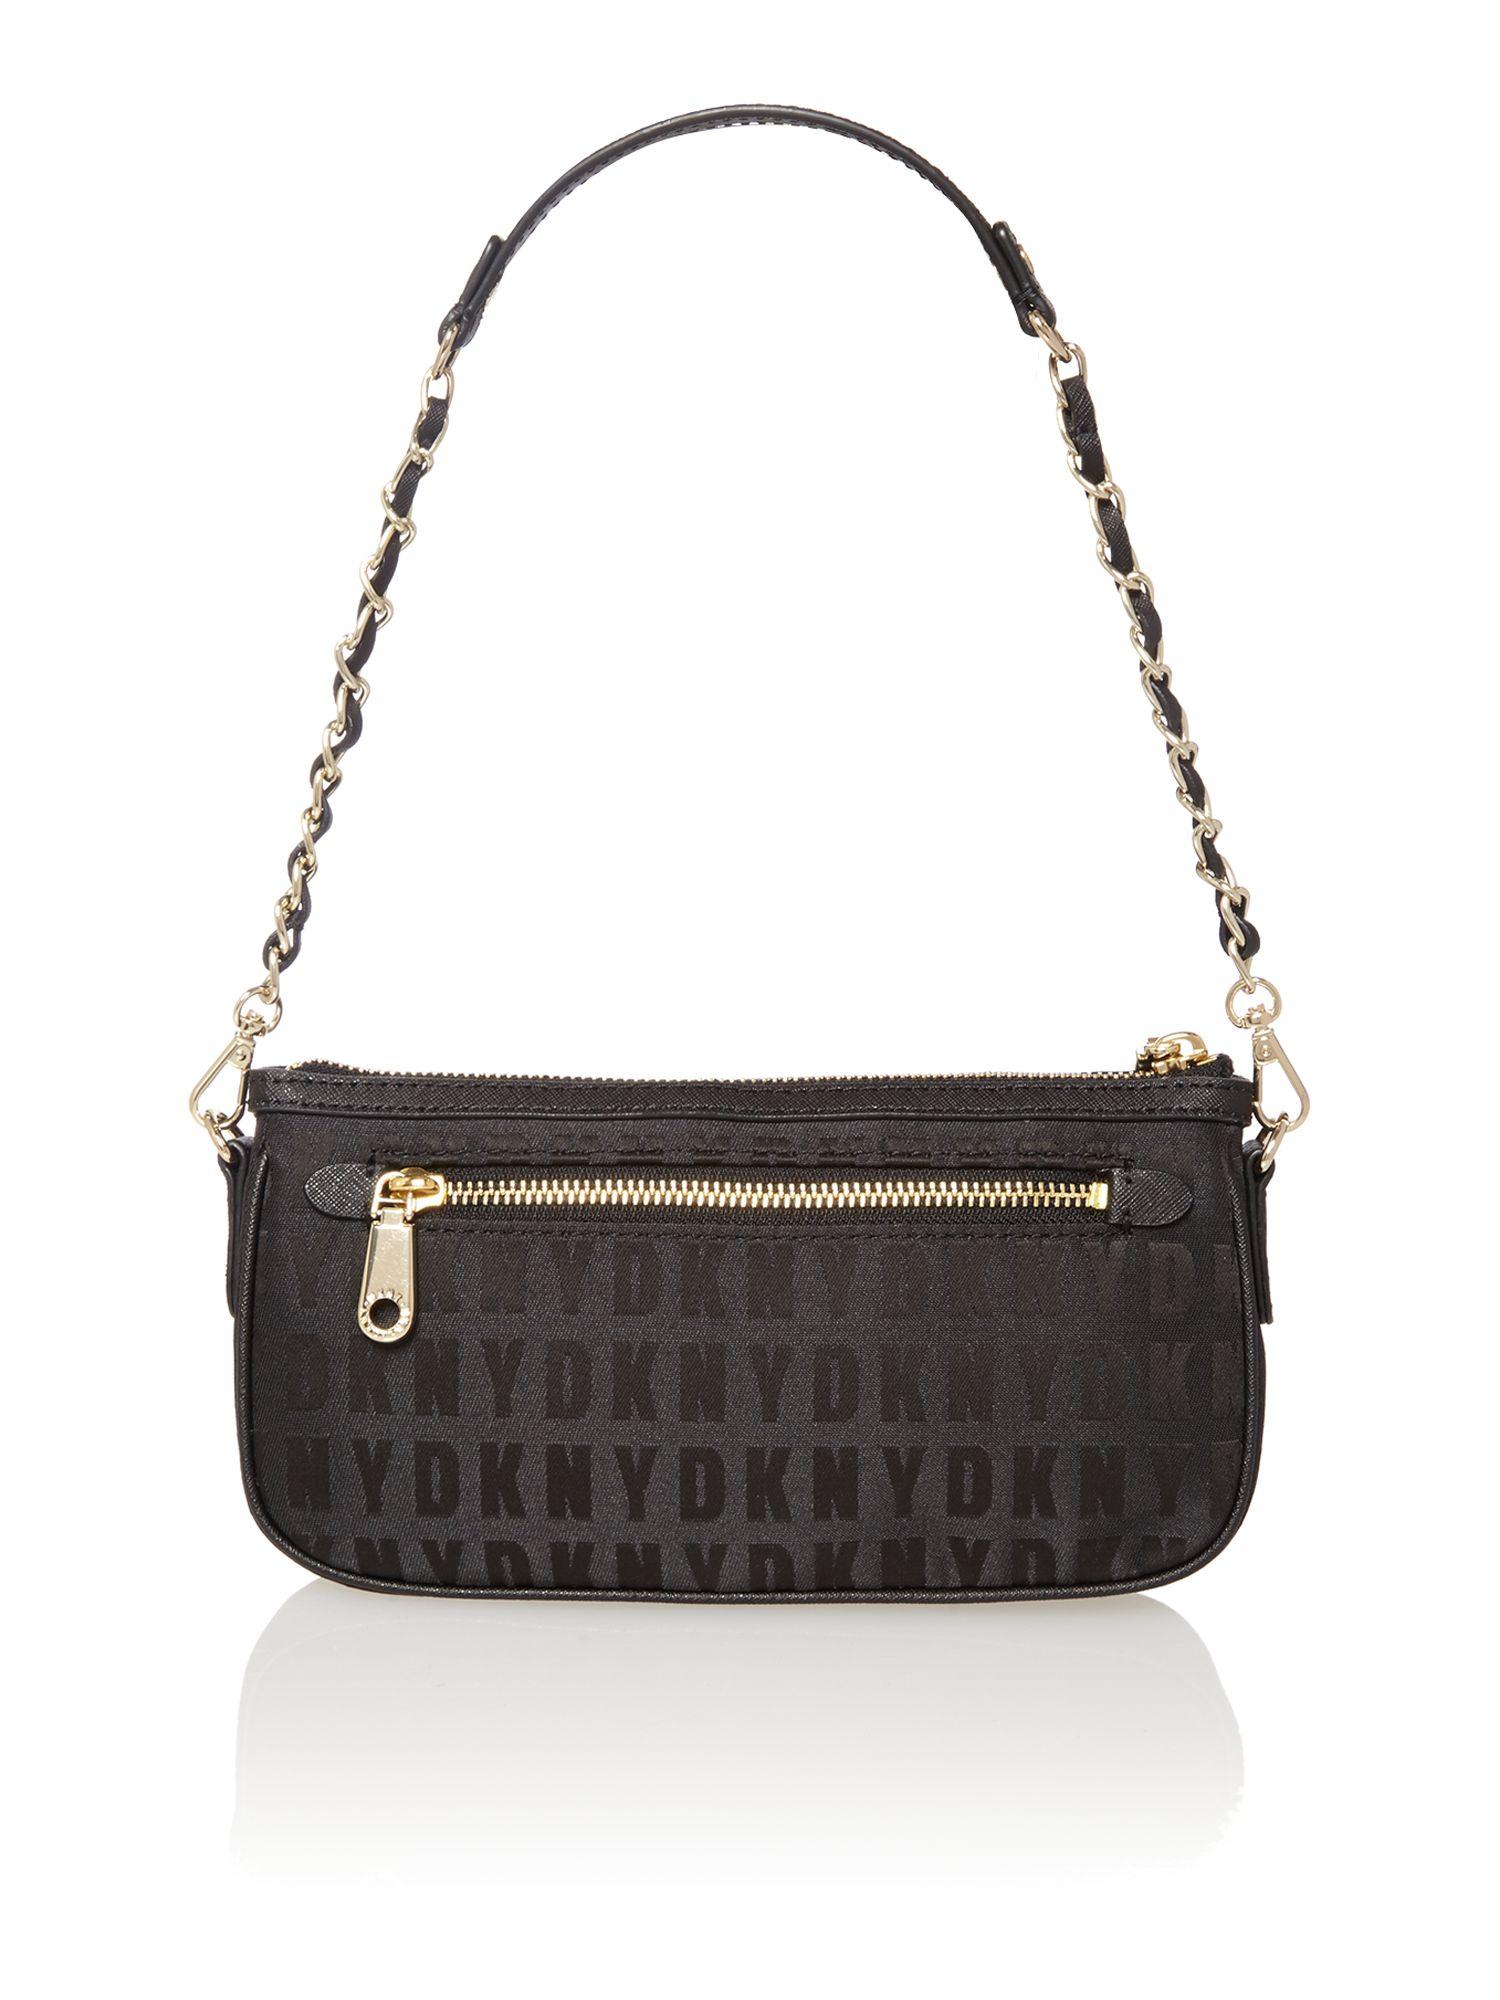 dkny saffiano black small chain shoulder bag in black lyst